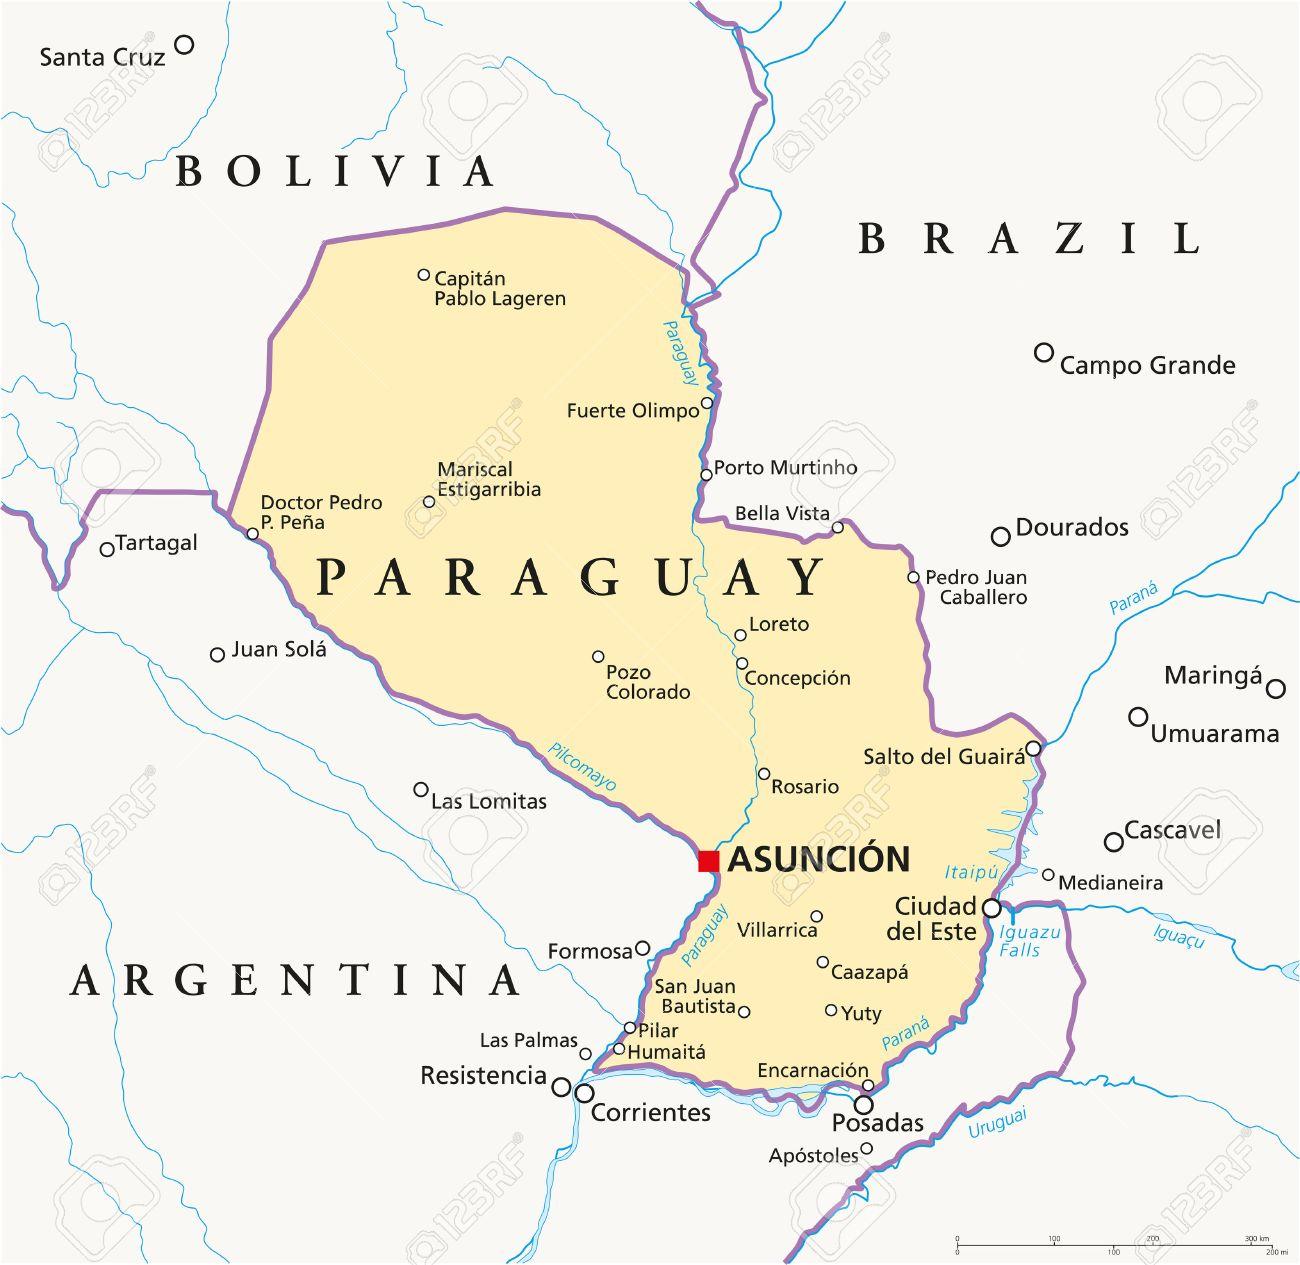 Asuncion Paraguay Map Paraguay Political Map With Capital Asuncion, National Borders